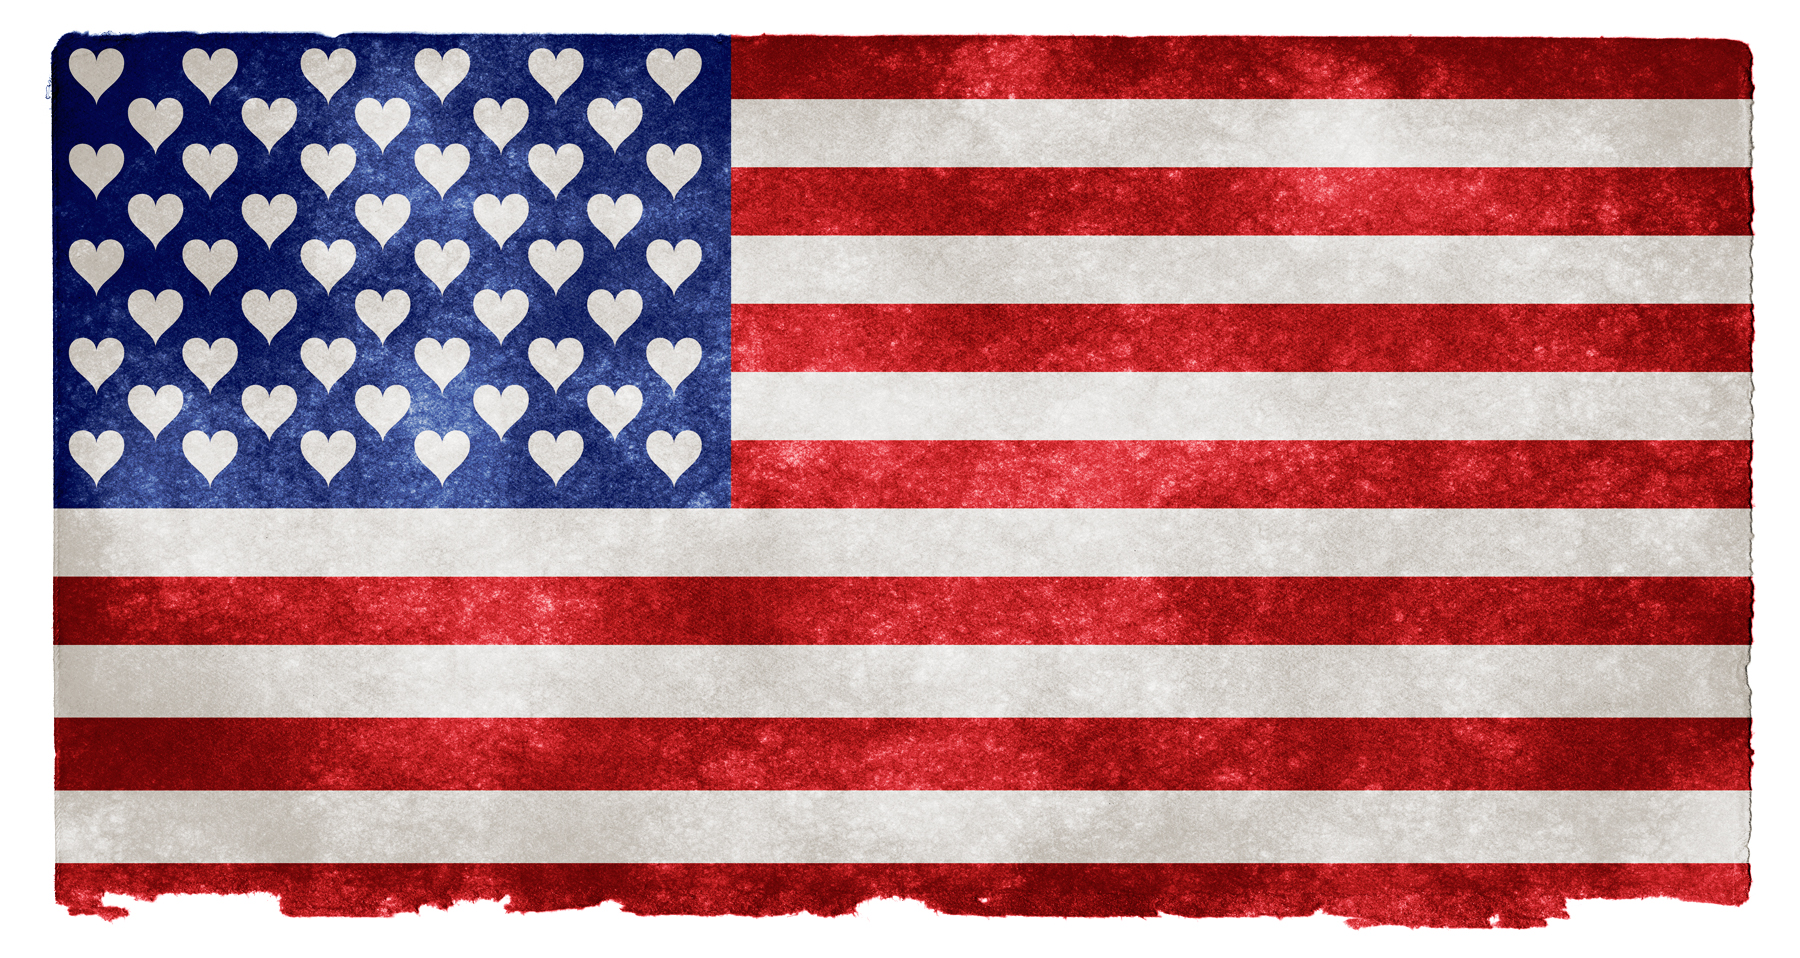 USA Love Grunge Flag, Aged, Somadjinn, Nation, National, HQ Photo